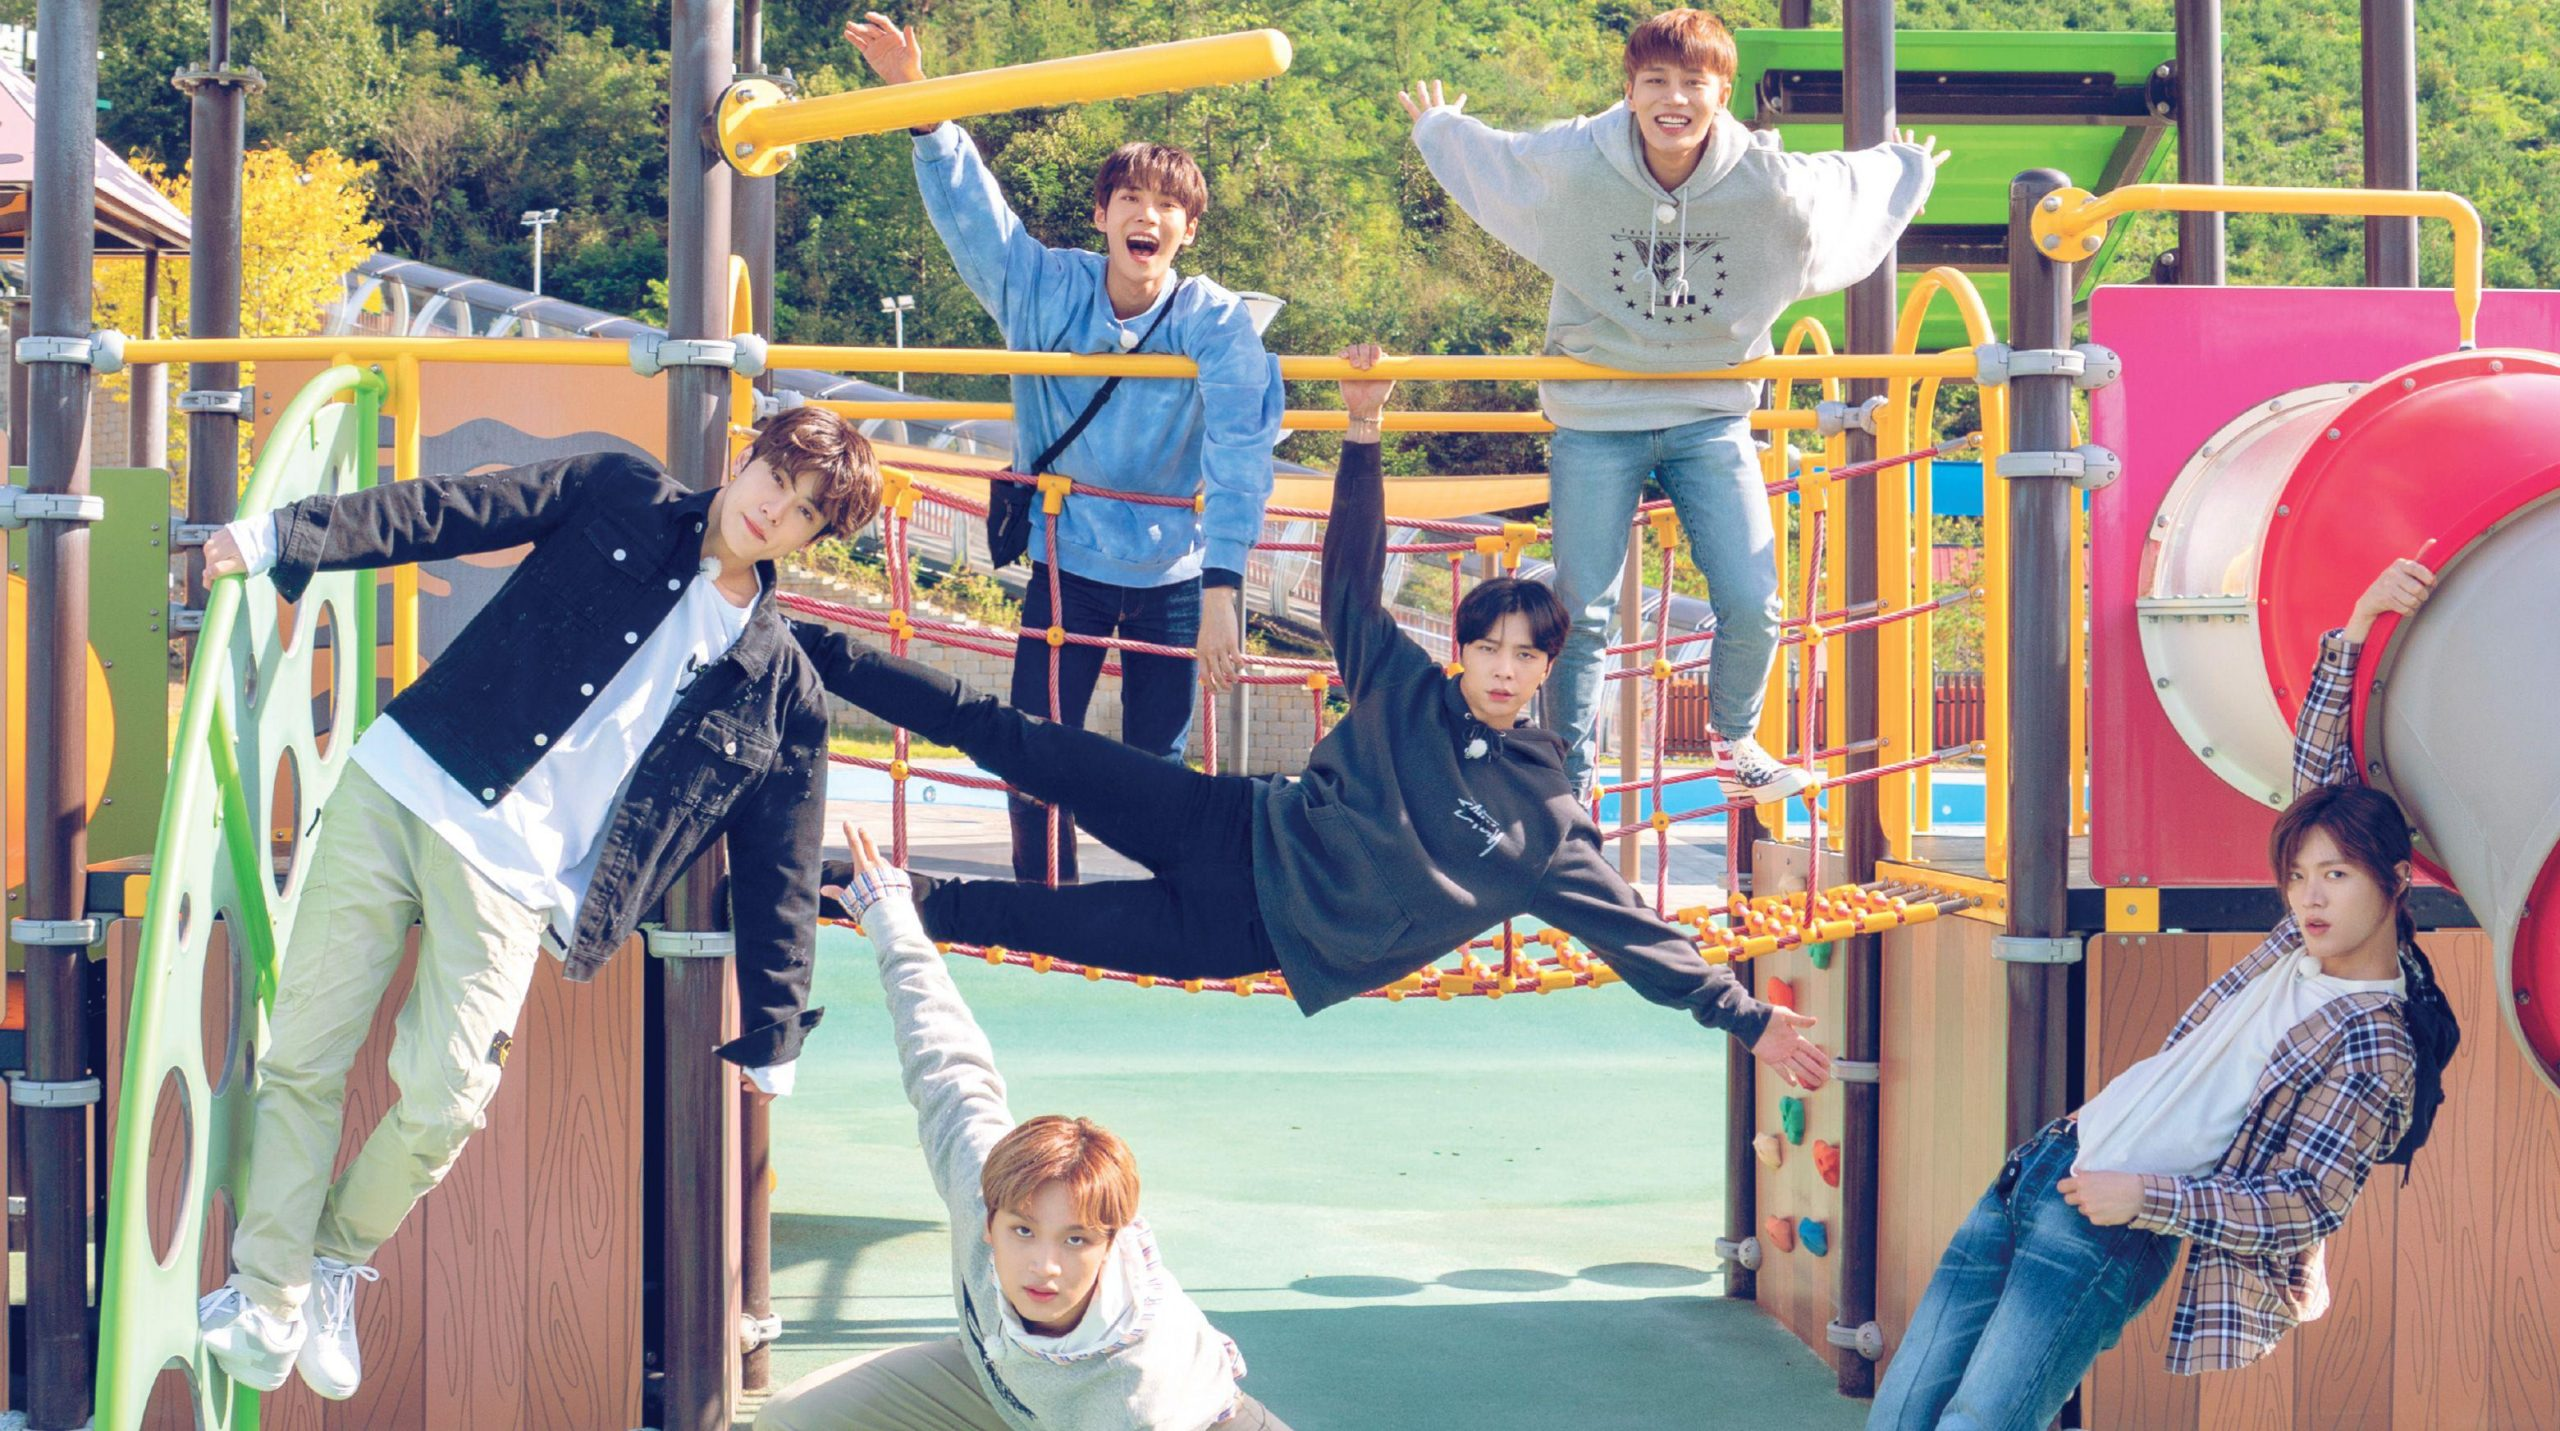 NCT Life In Gapyeong Season 2: Is The TV Show Renewed?